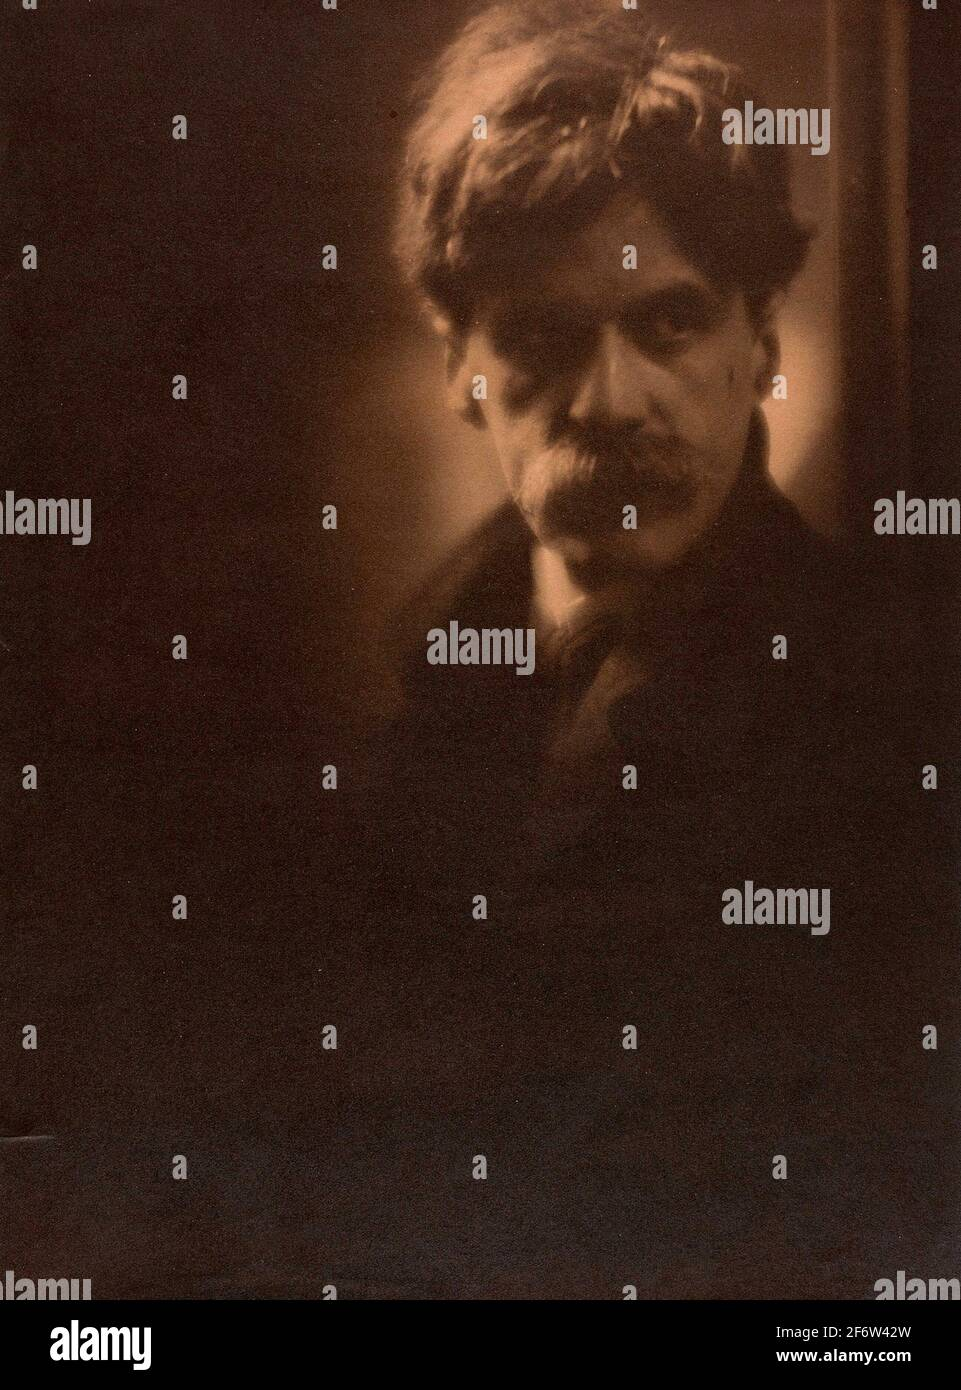 Clarence H. blanc. Alfred Stieglitz-1907/08-Clarence H. White American, 1871-1925. Imprimé platine. 1907-1908. États-Unis. Banque D'Images